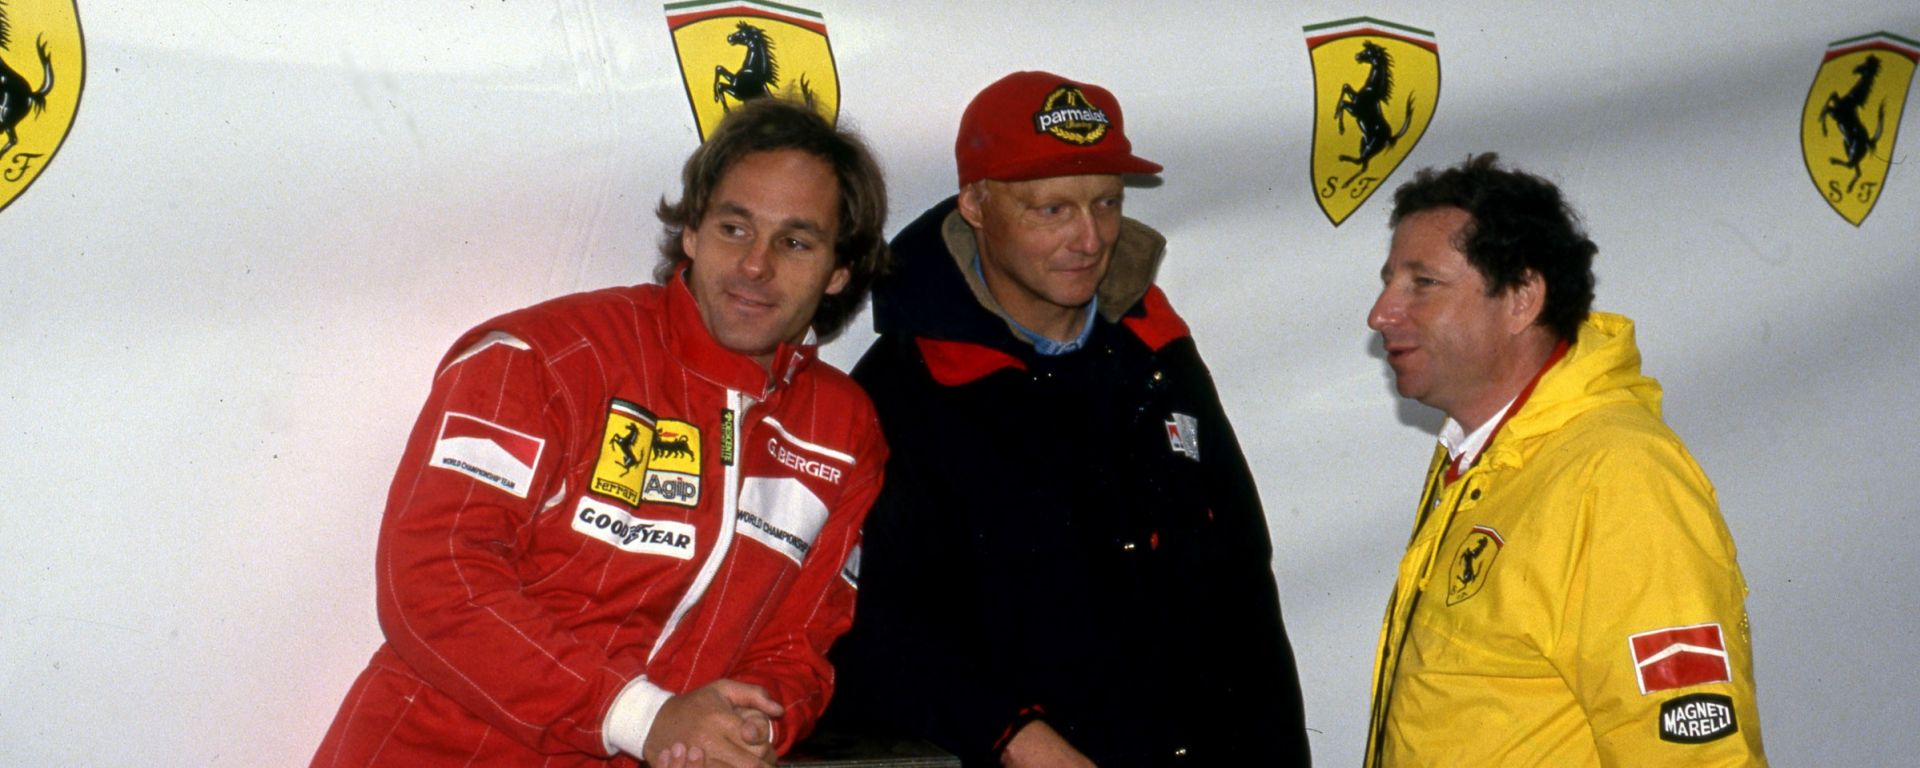 F1 1993: Jean Todt con Gerhard Berger e Niki Lauda